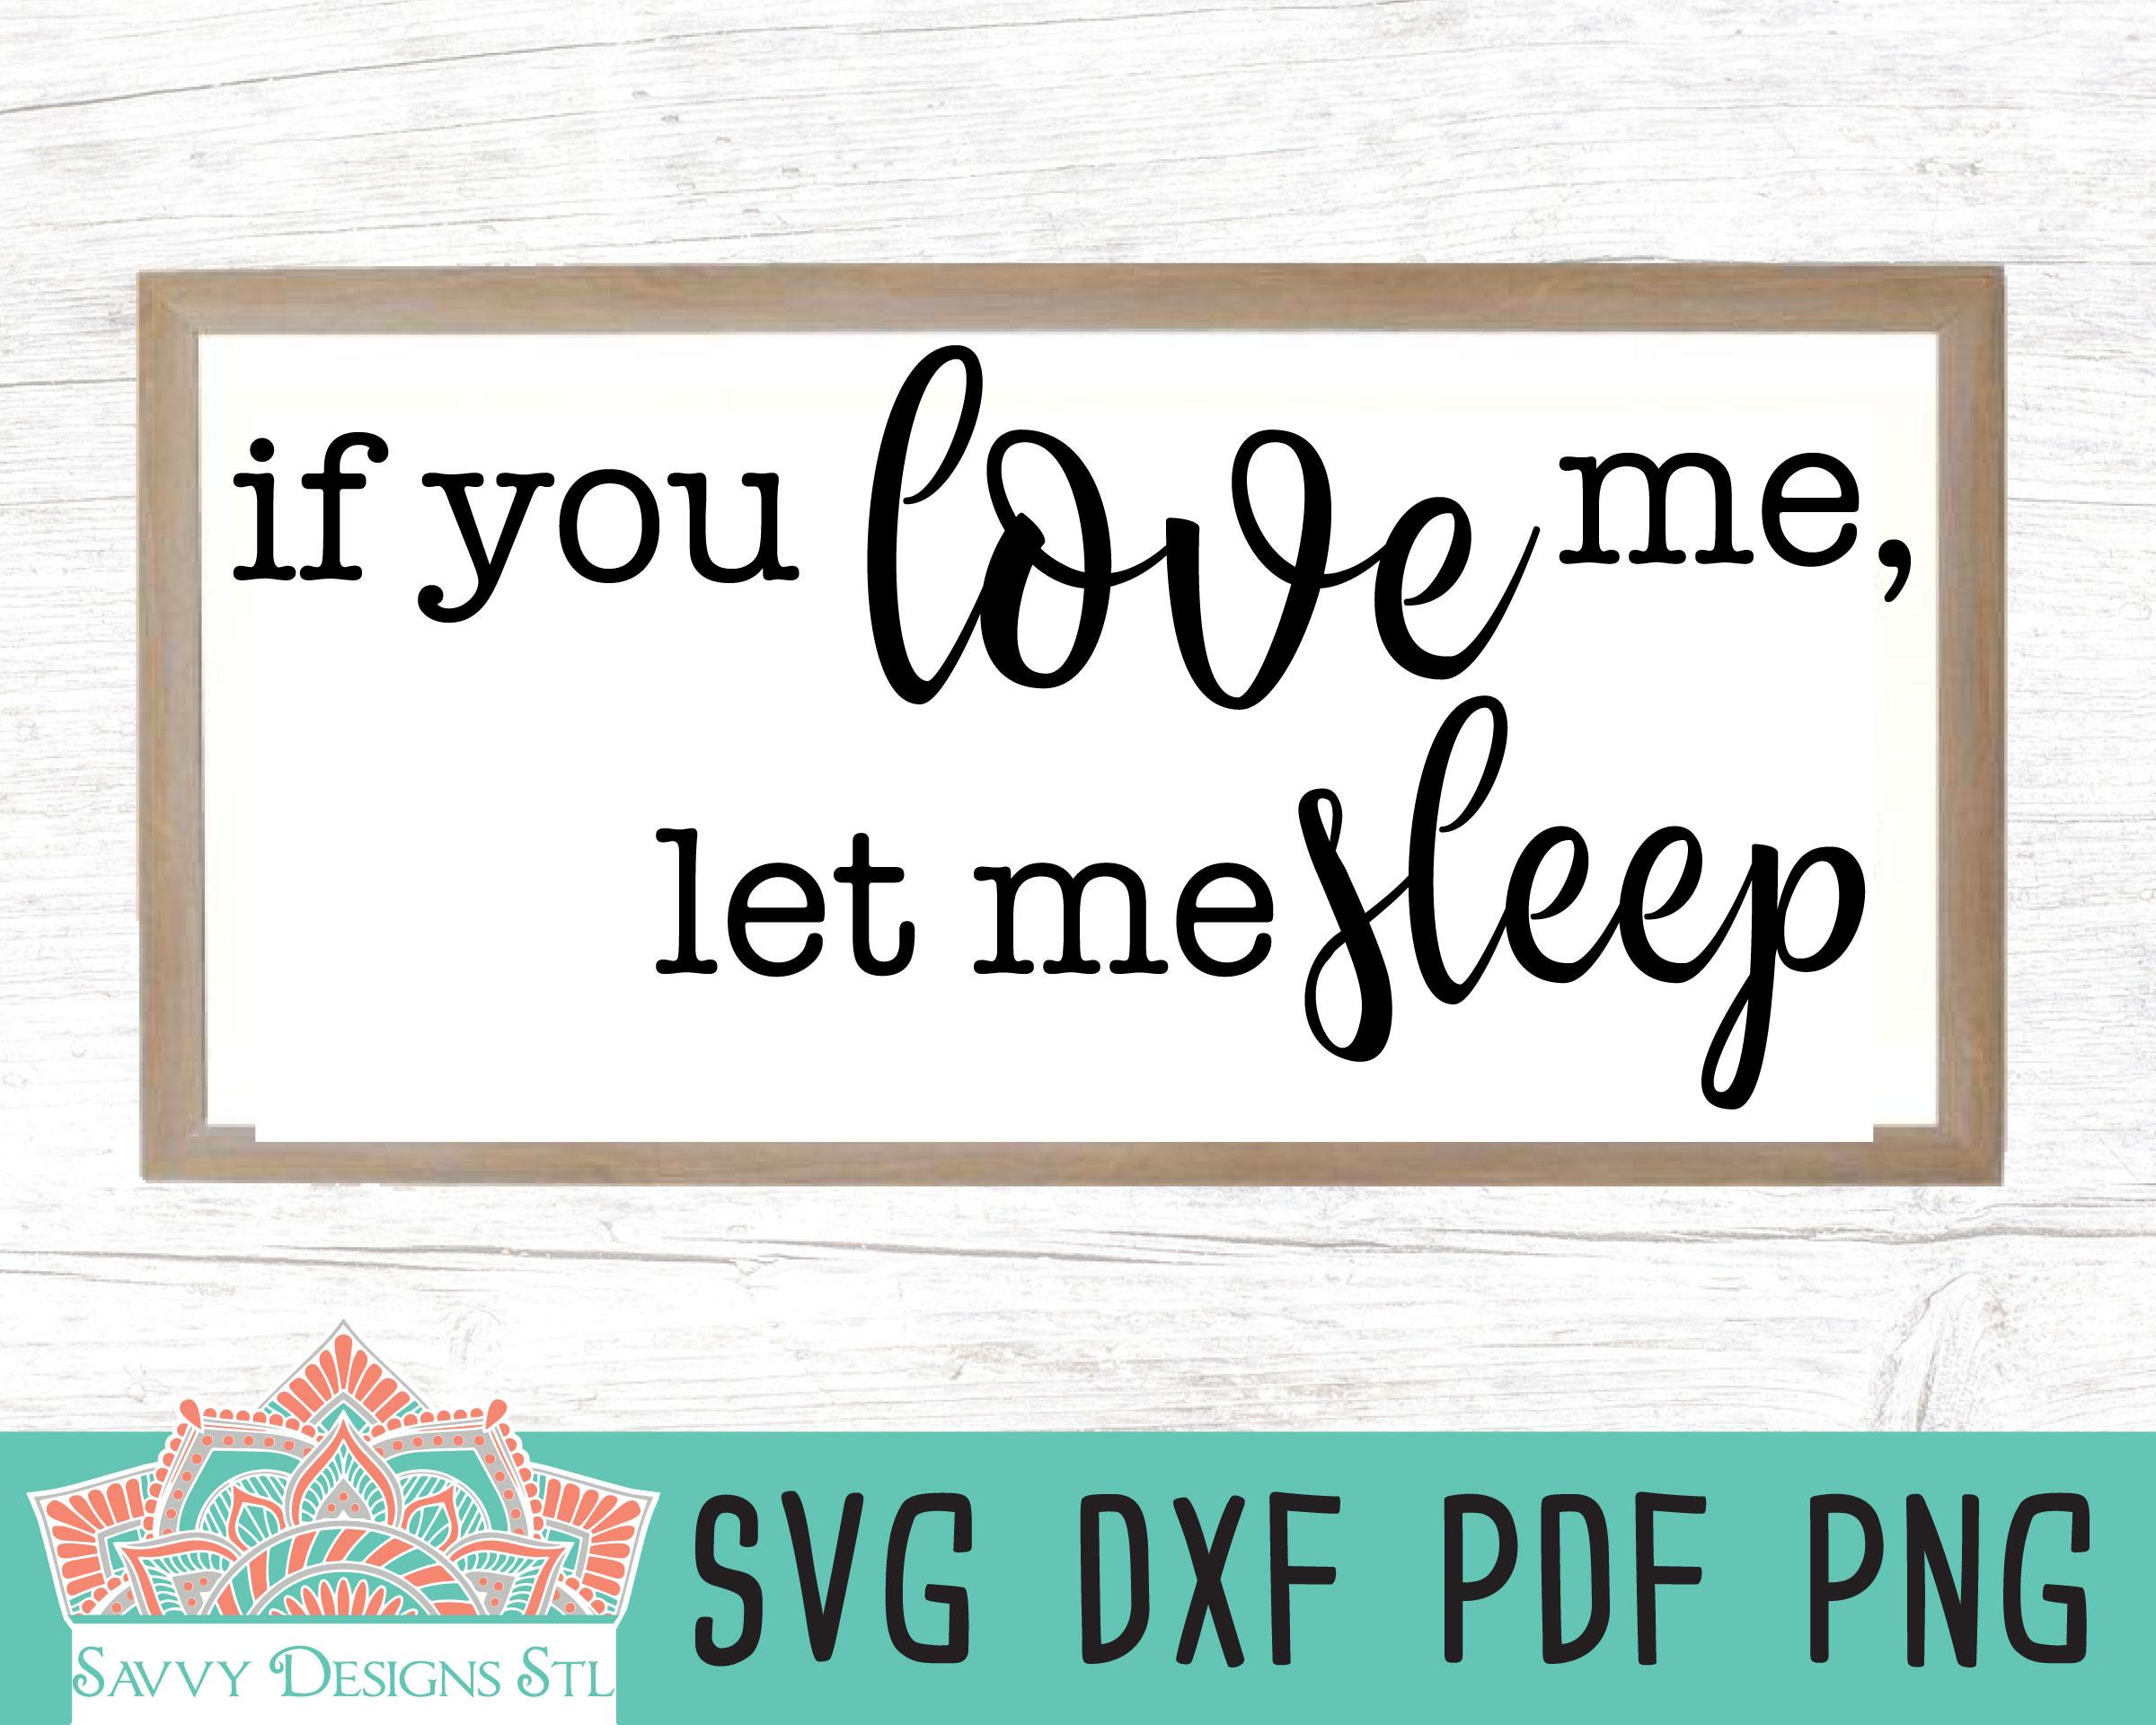 Download If You Love Me Let Me Sleep Cut File - Savvy Designs Stl